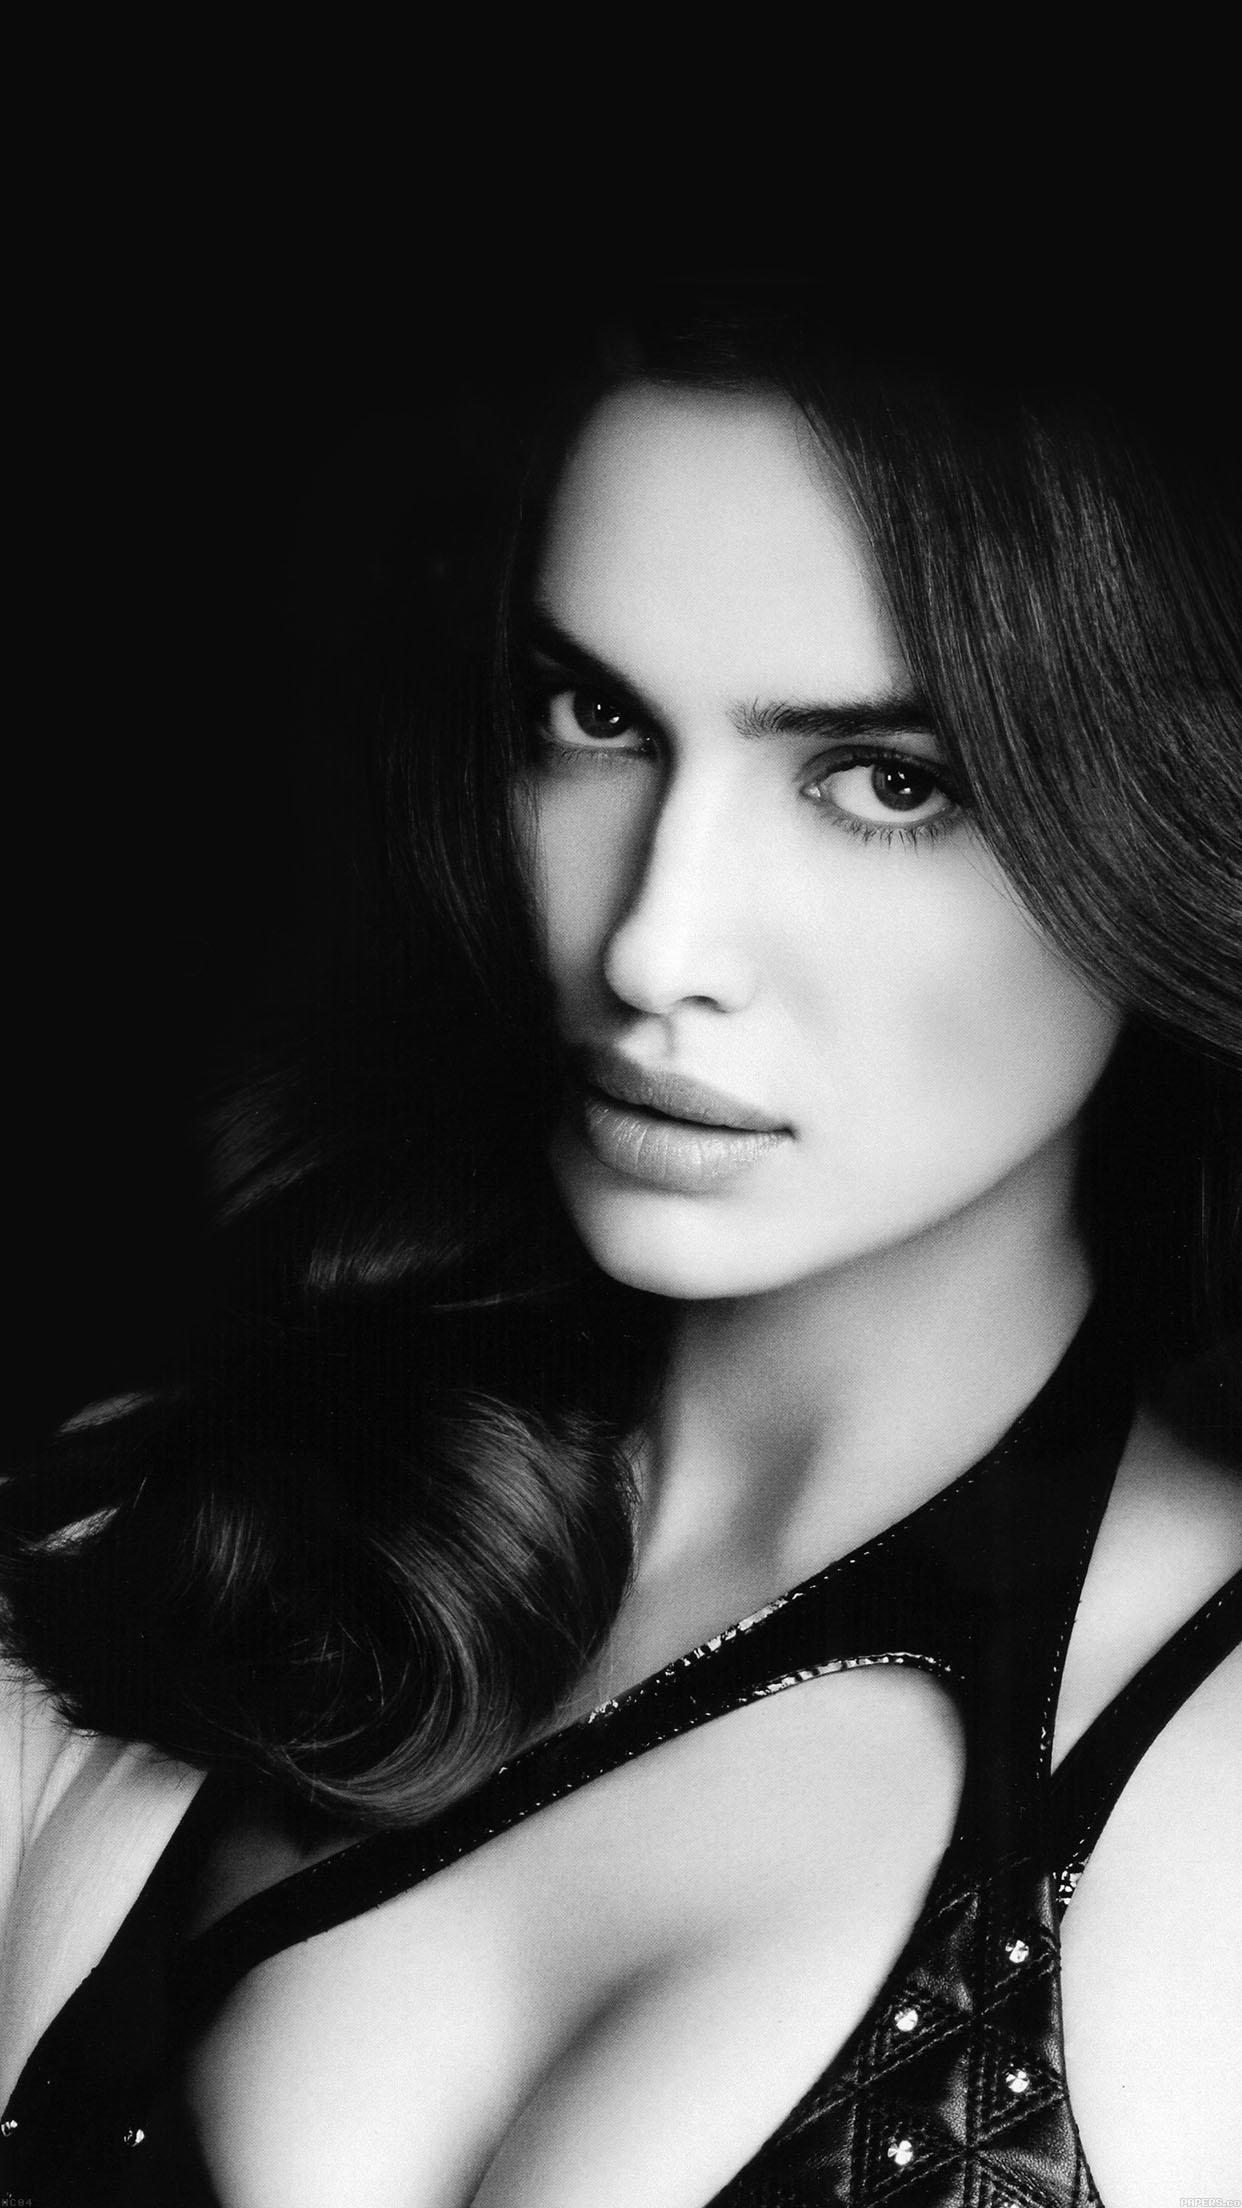 Irina Shayk Model Sexy Android Wallpaper Android Hd